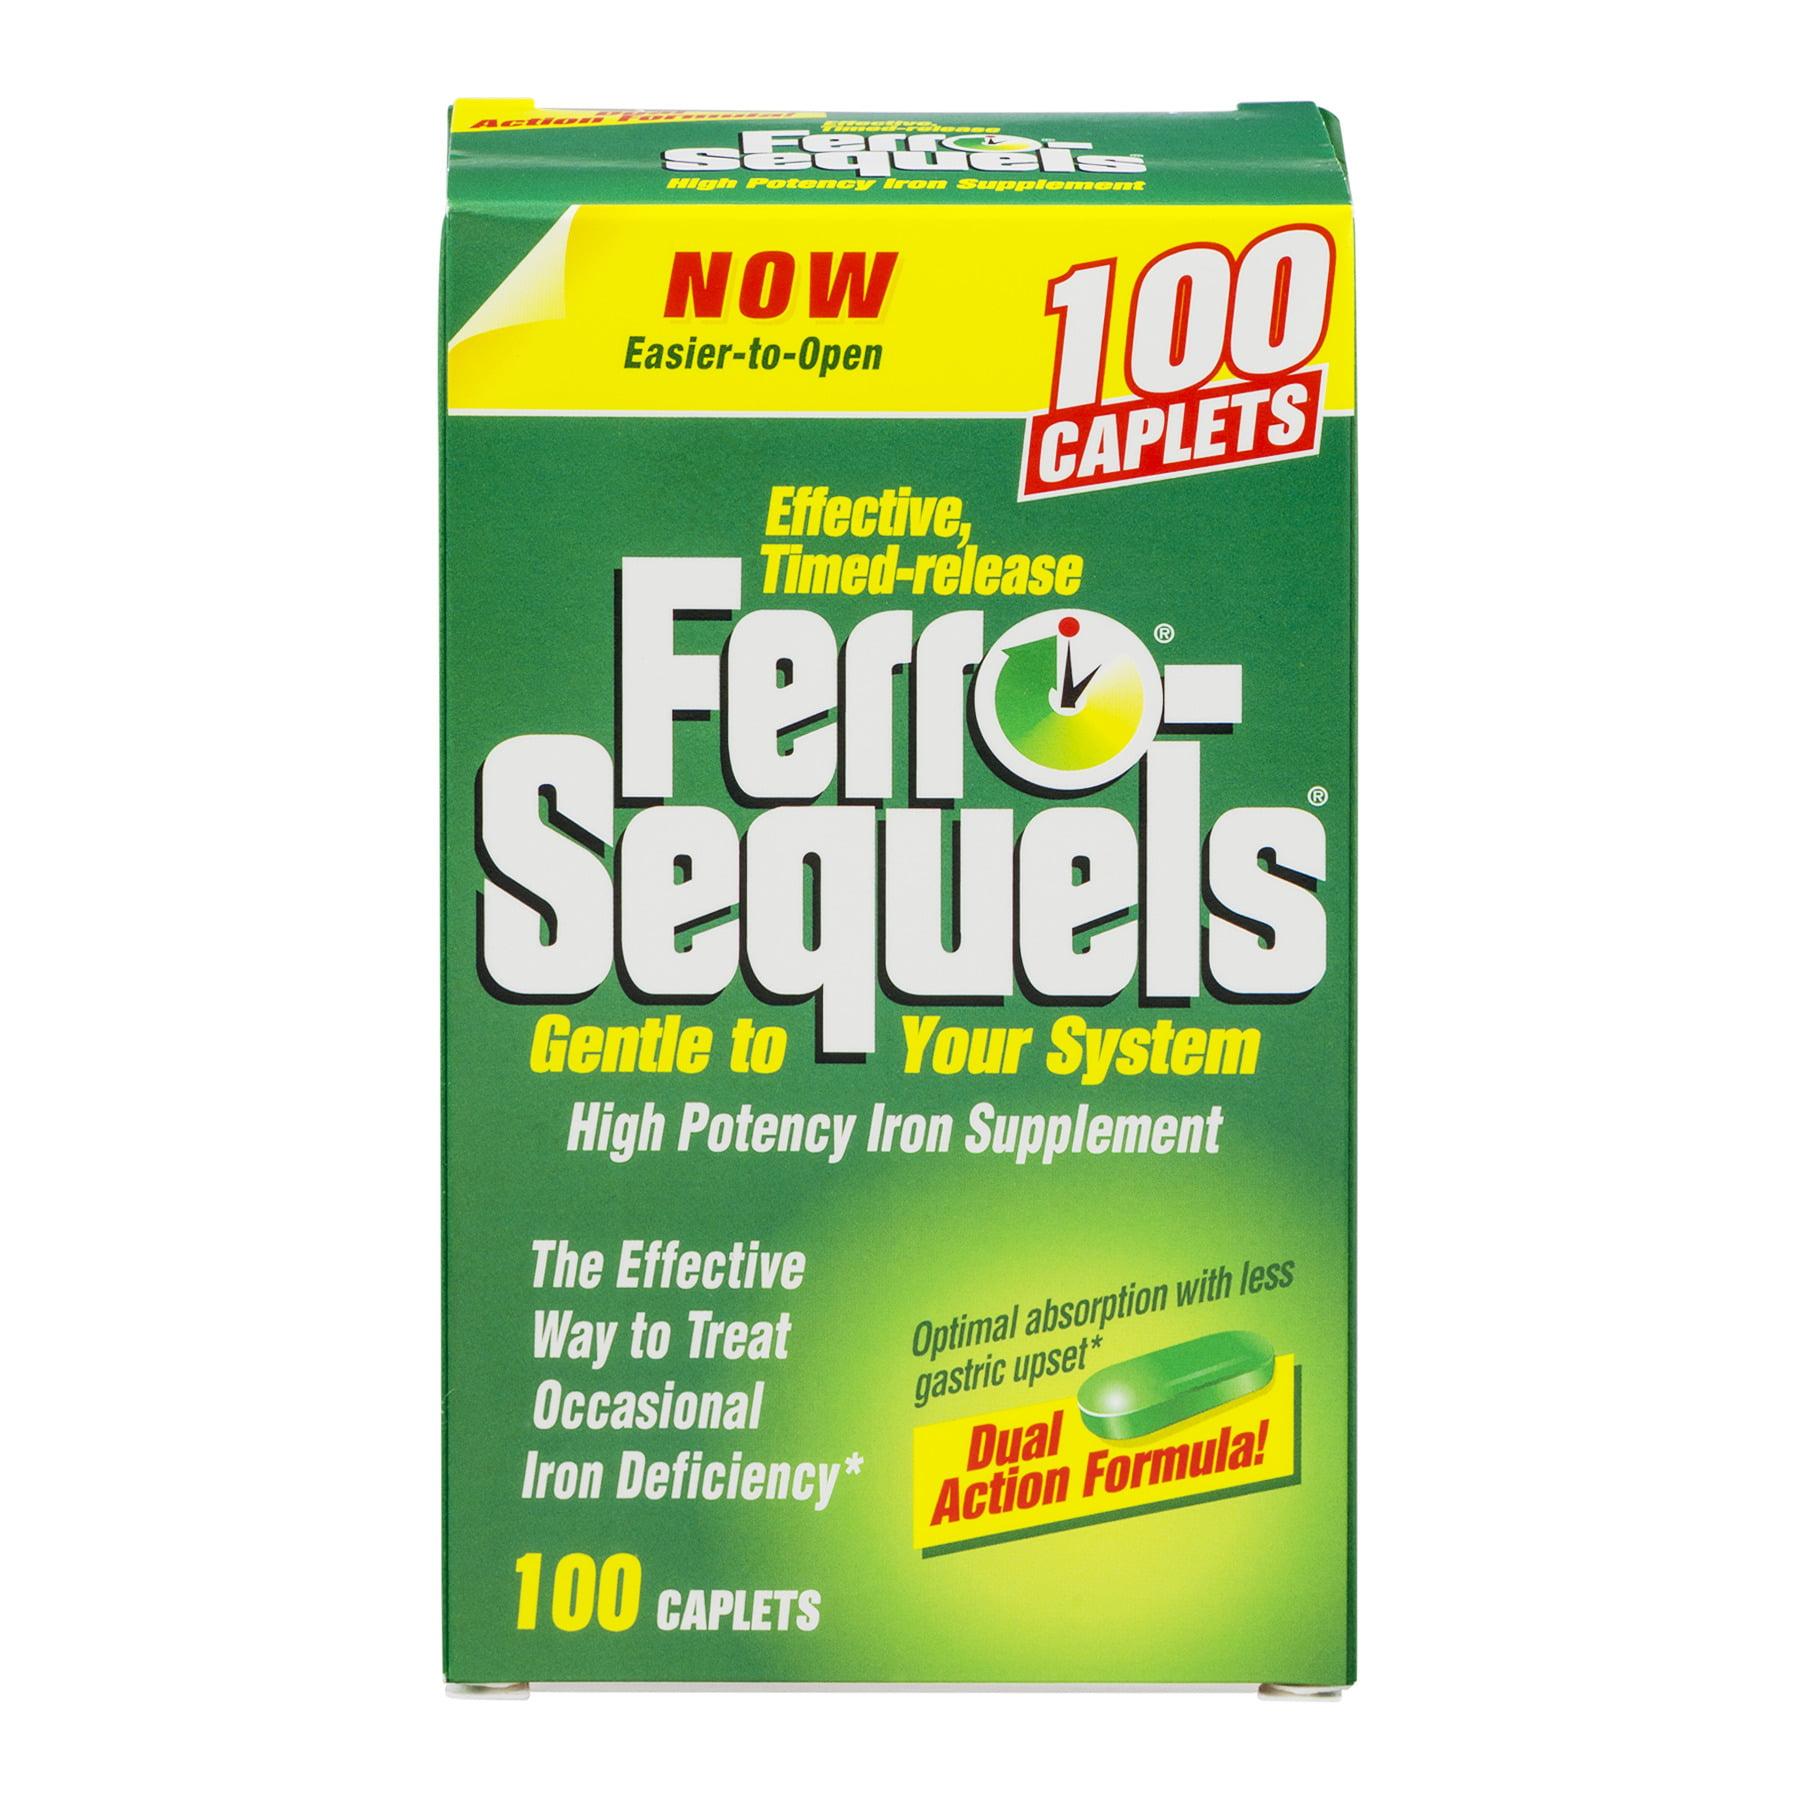 Ferro-Sequels High Potency Iron Supplement - 100 CT100.0 CT